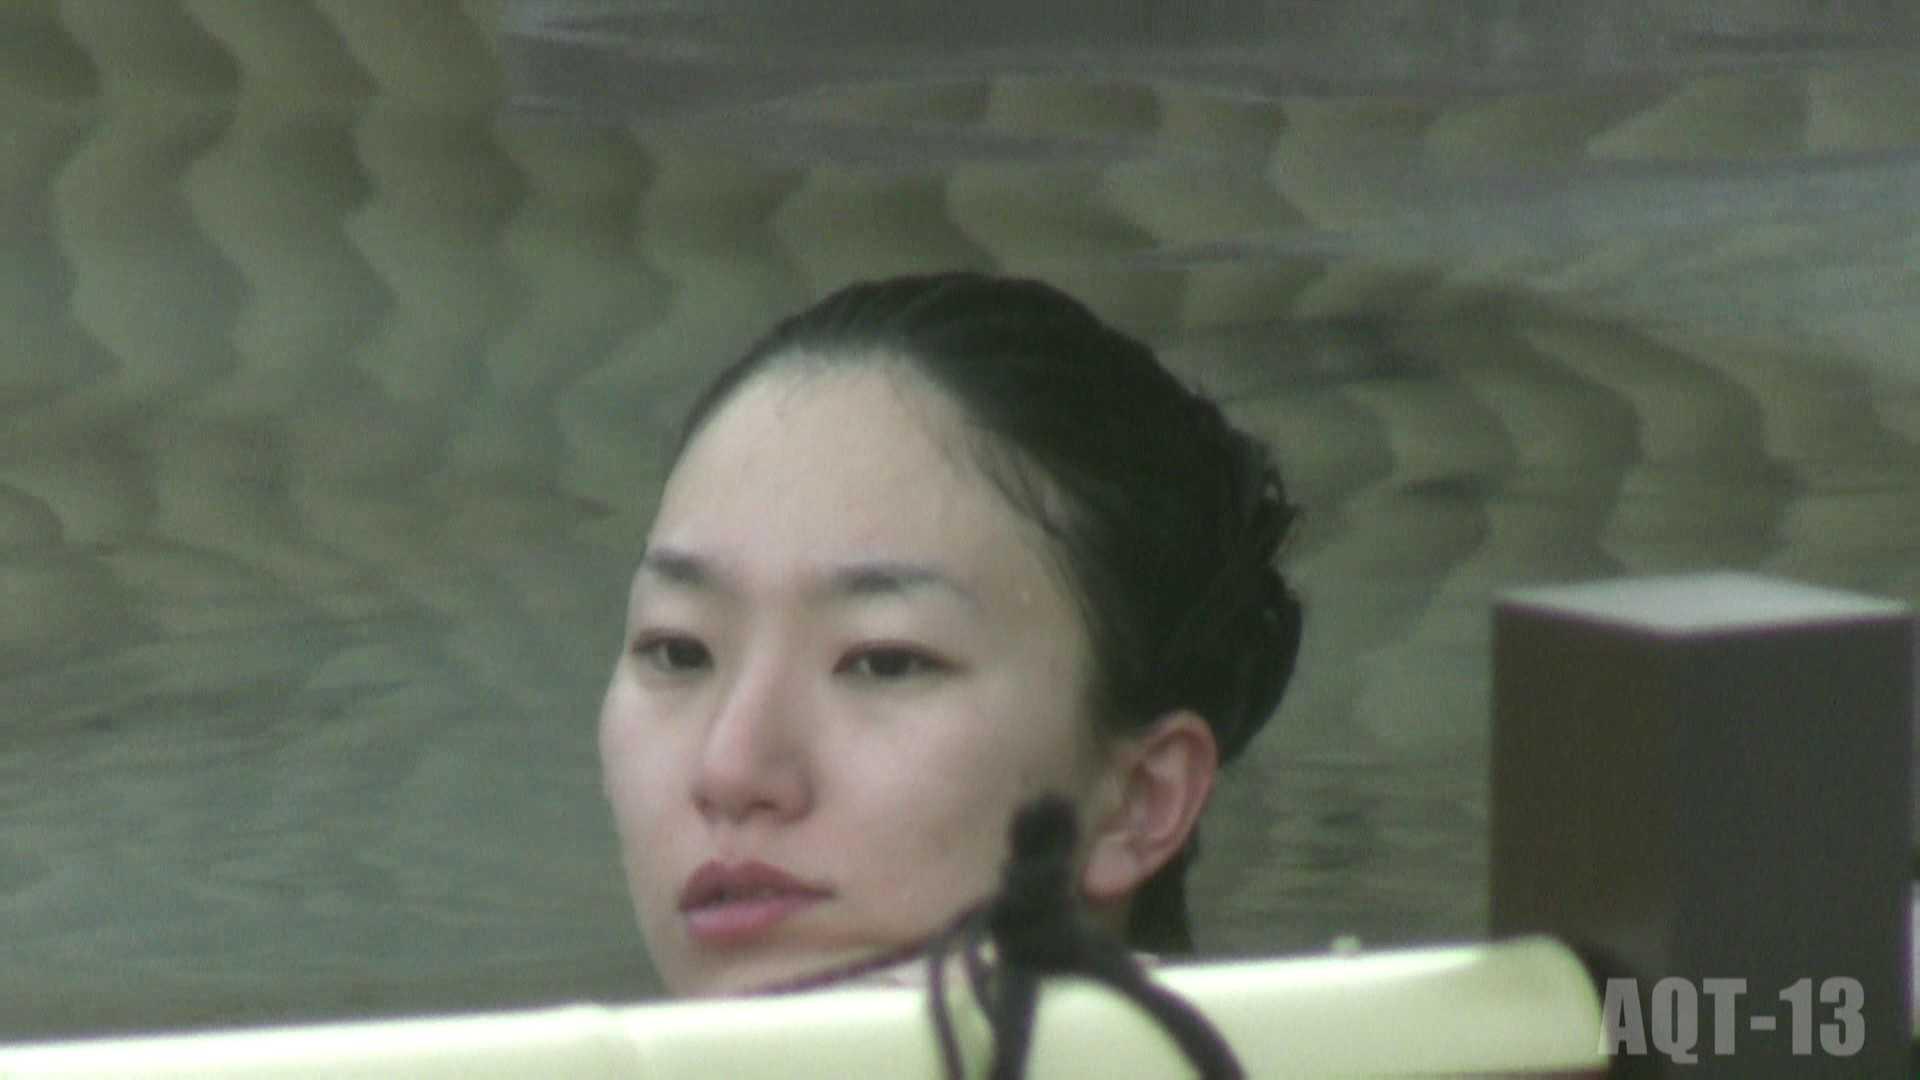 Aquaな露天風呂Vol.818 露天風呂突入 盗み撮り動画キャプチャ 71pic 41